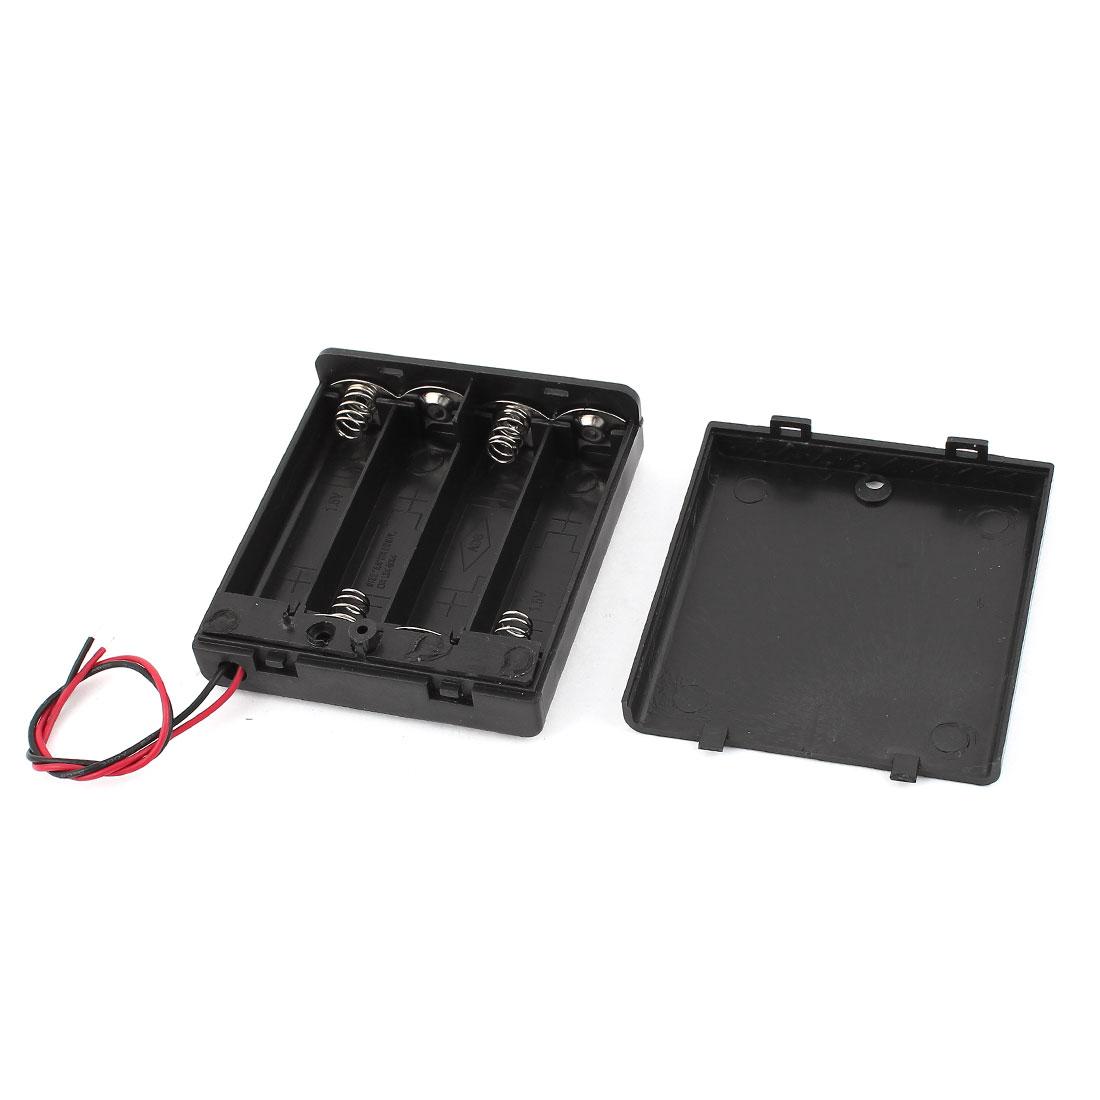 Black Plastic 15cm Leads Switch 4x 1.5V AA Battery Box Case Holder - image 2 of 2